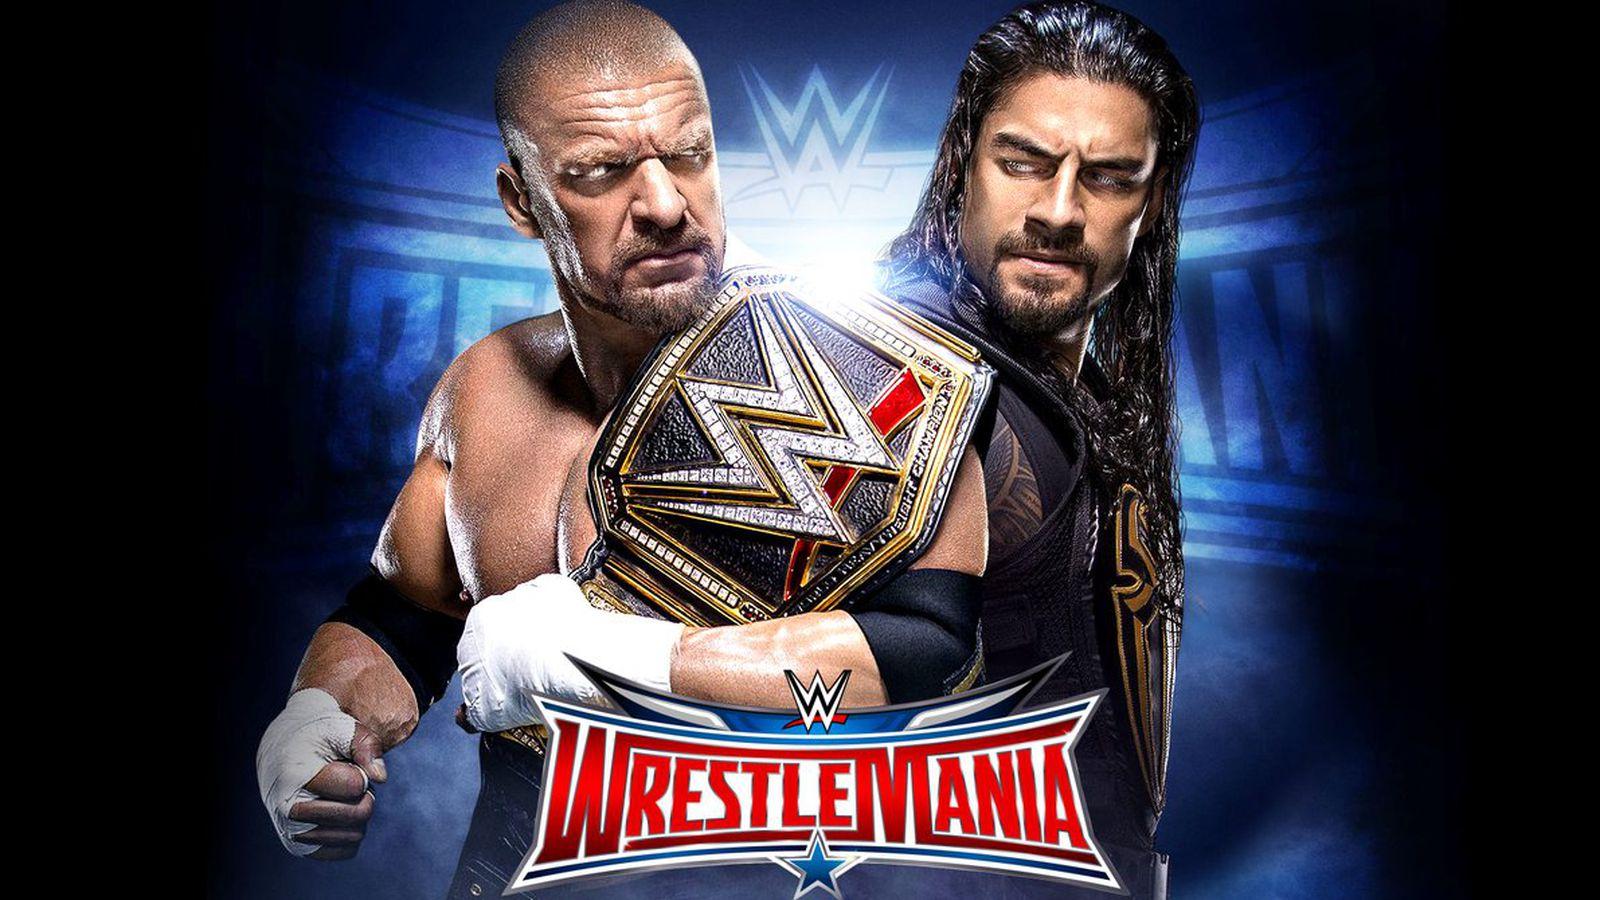 Wrestlemania 2016 date